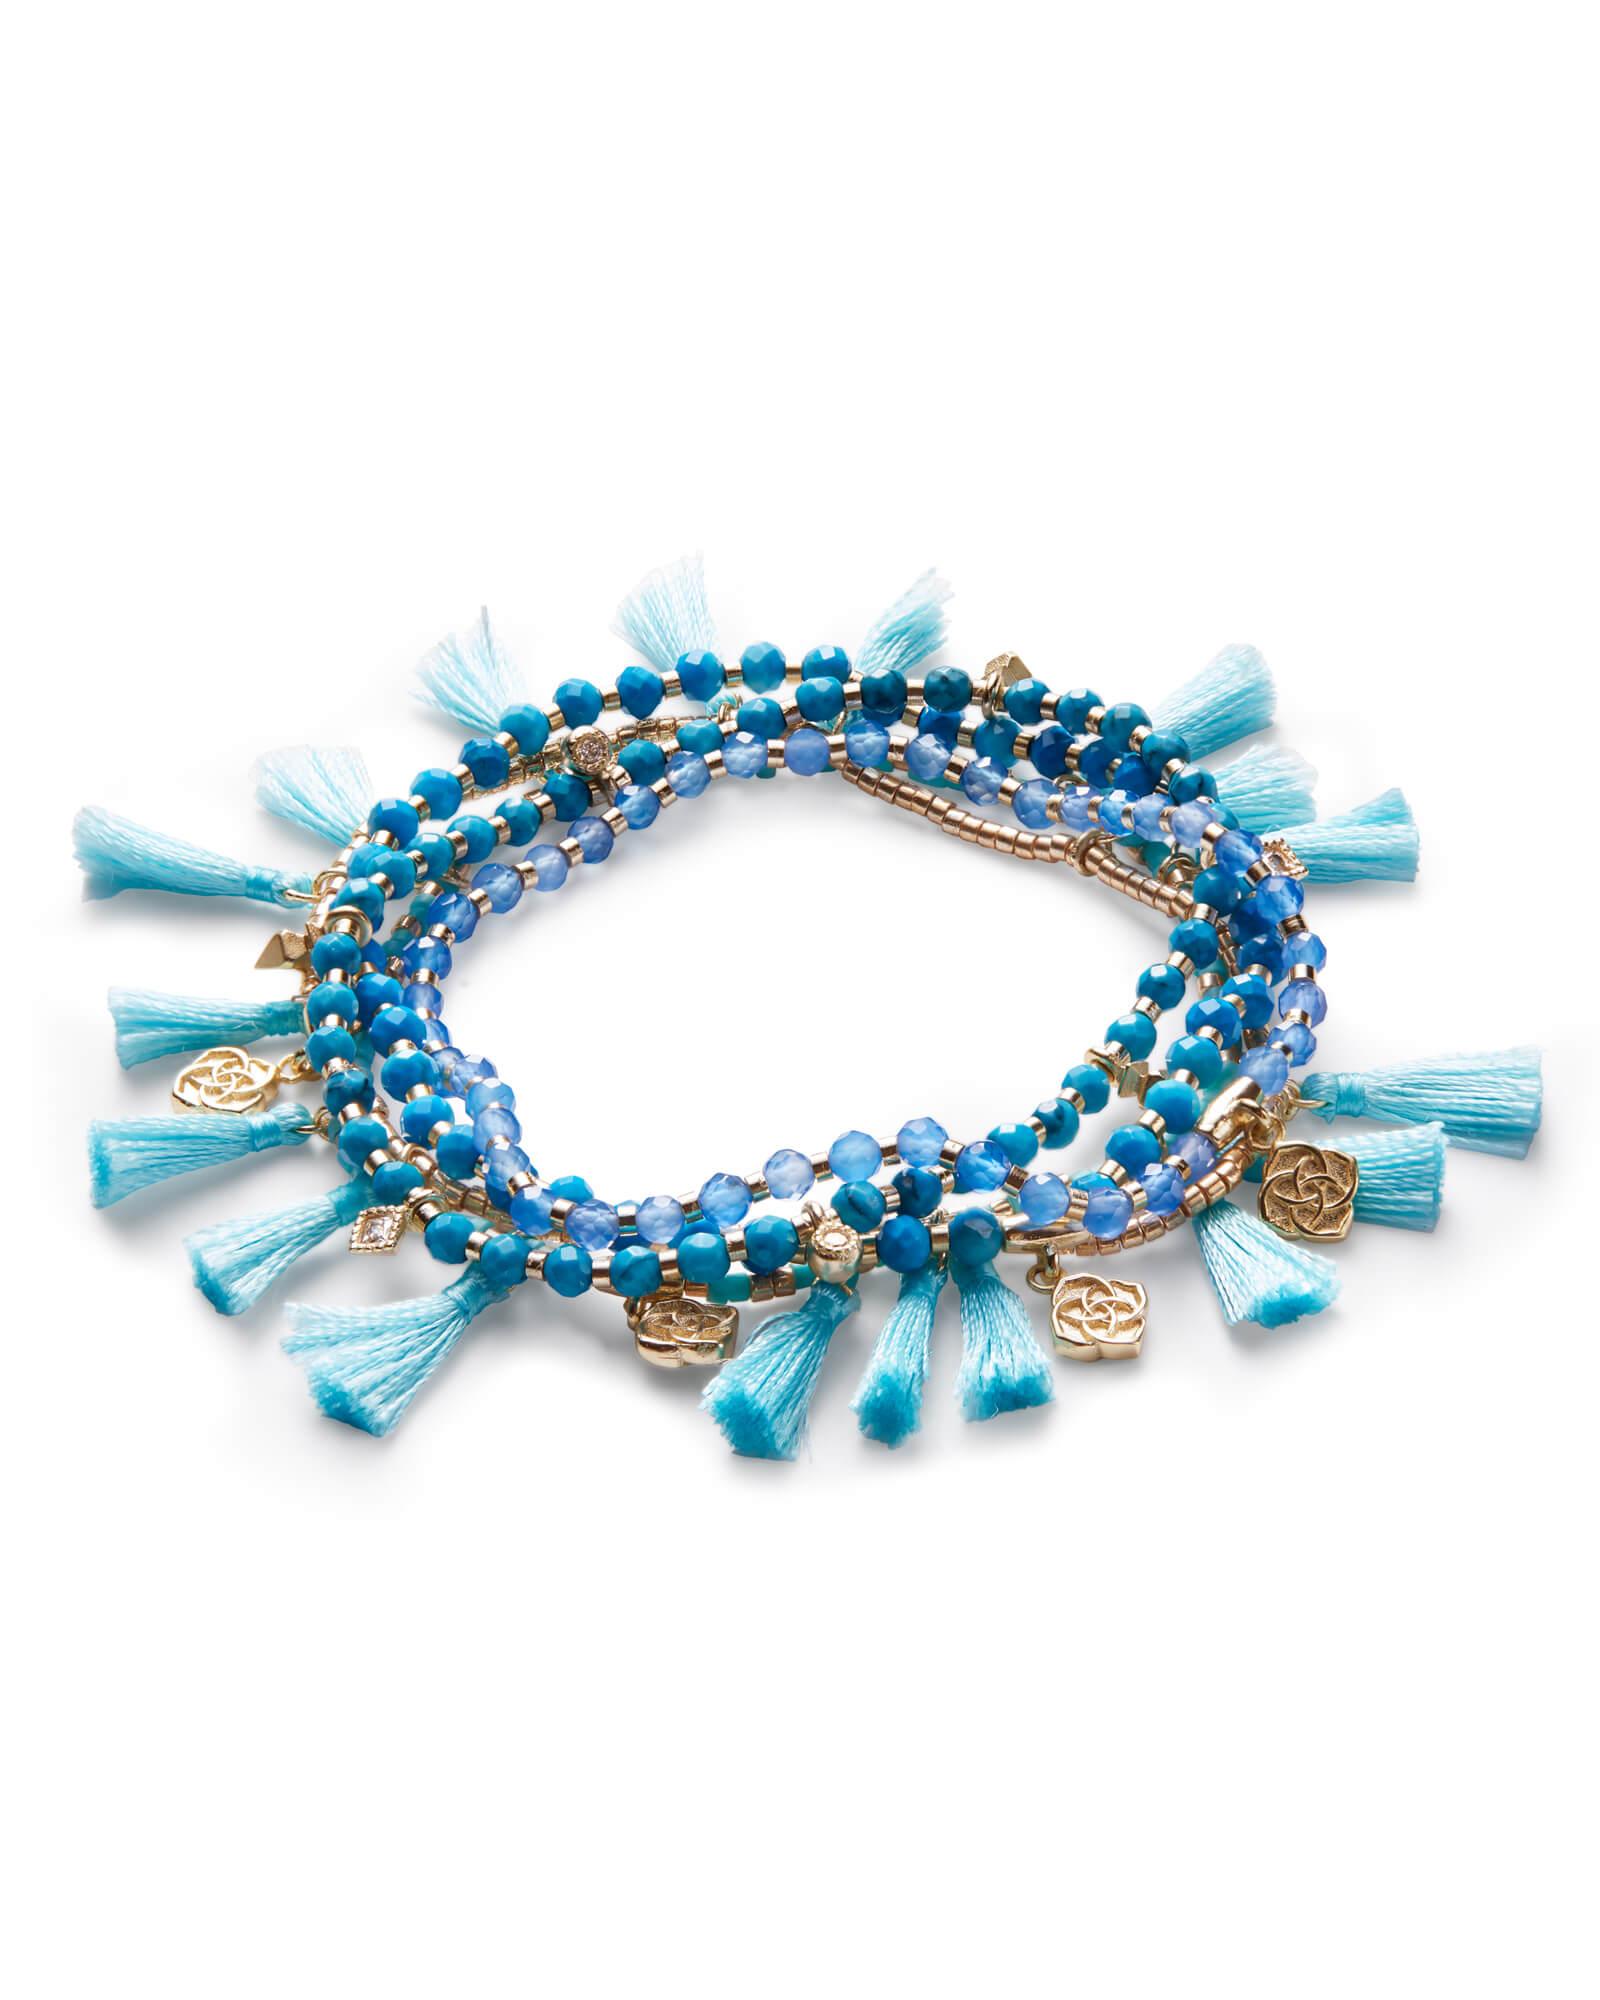 kendra-scott-julie-beaded-bracelet-set-in-aqua-howlite_00_default_lg.jpg